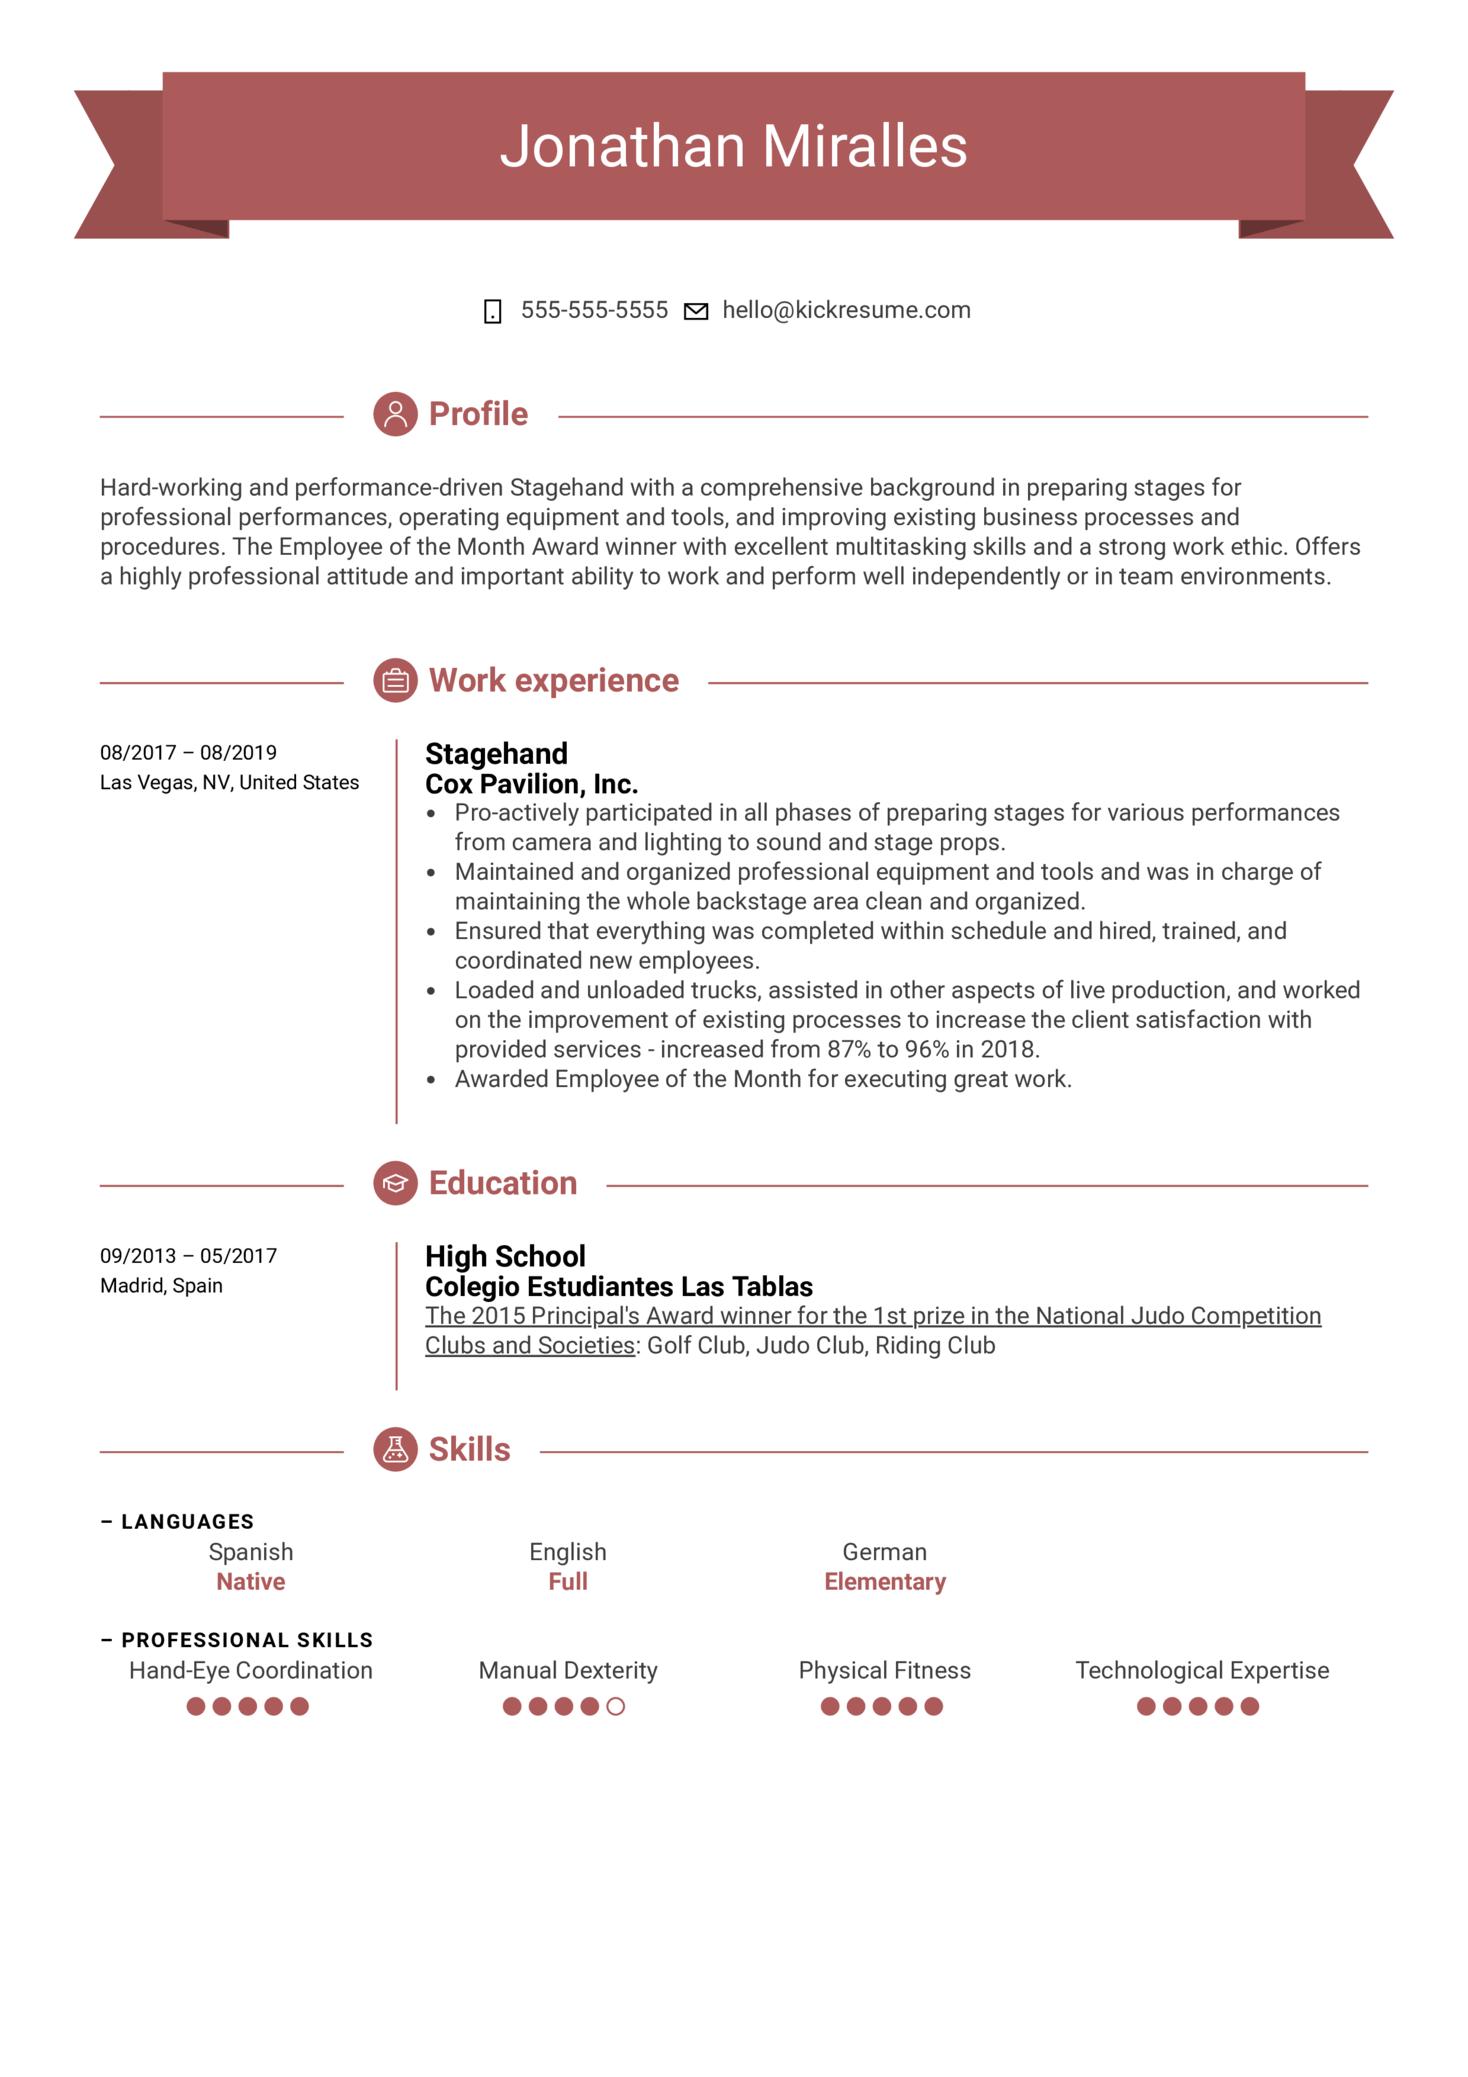 Stagehand Resume Example (parte 1)